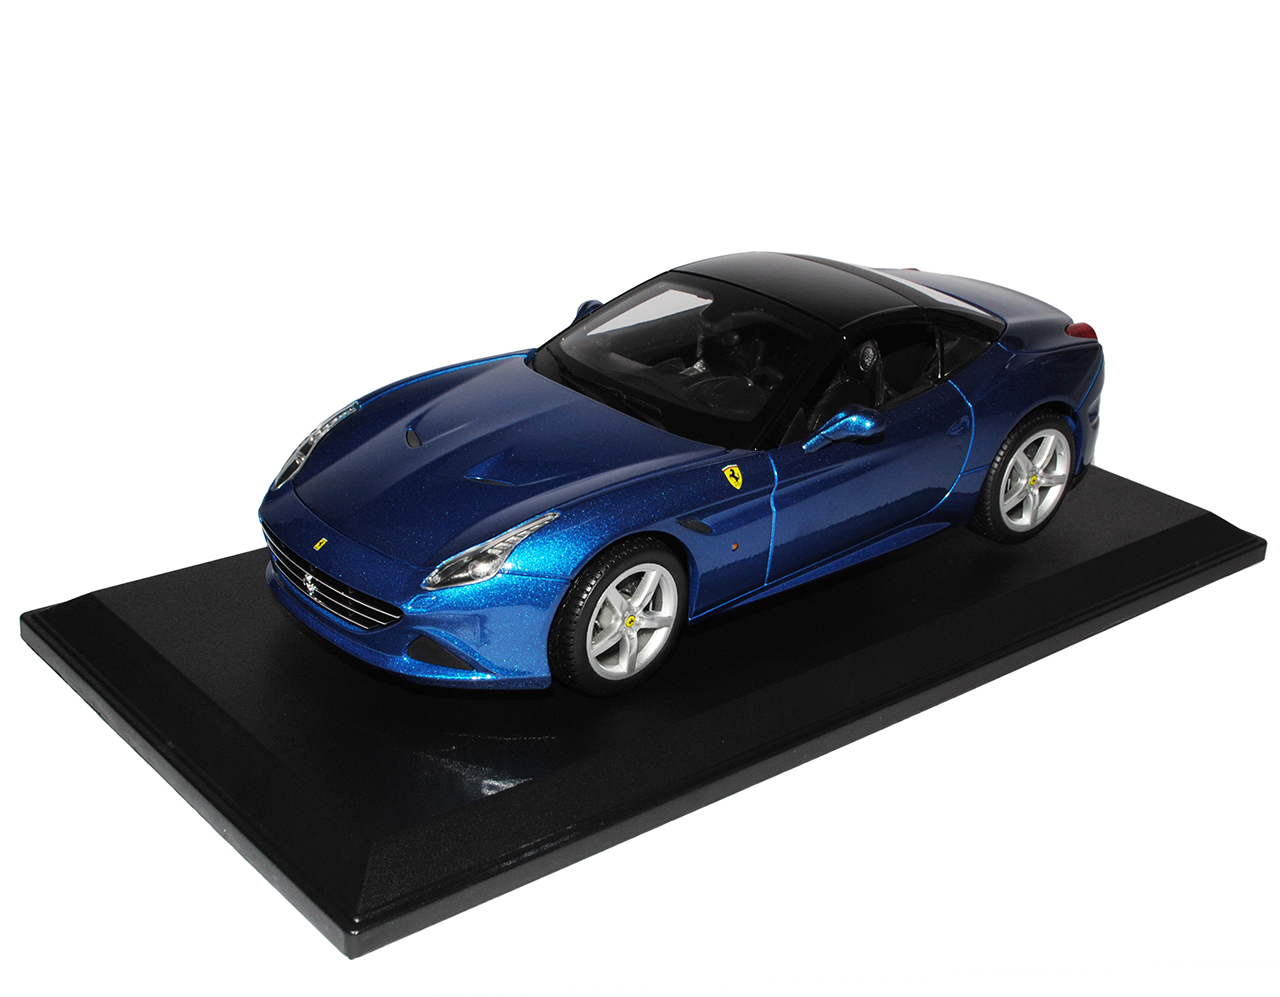 Ferrari California T Coupe Geschlossen Blau Ab 2015 1//18 Bburago Modell Auto m..